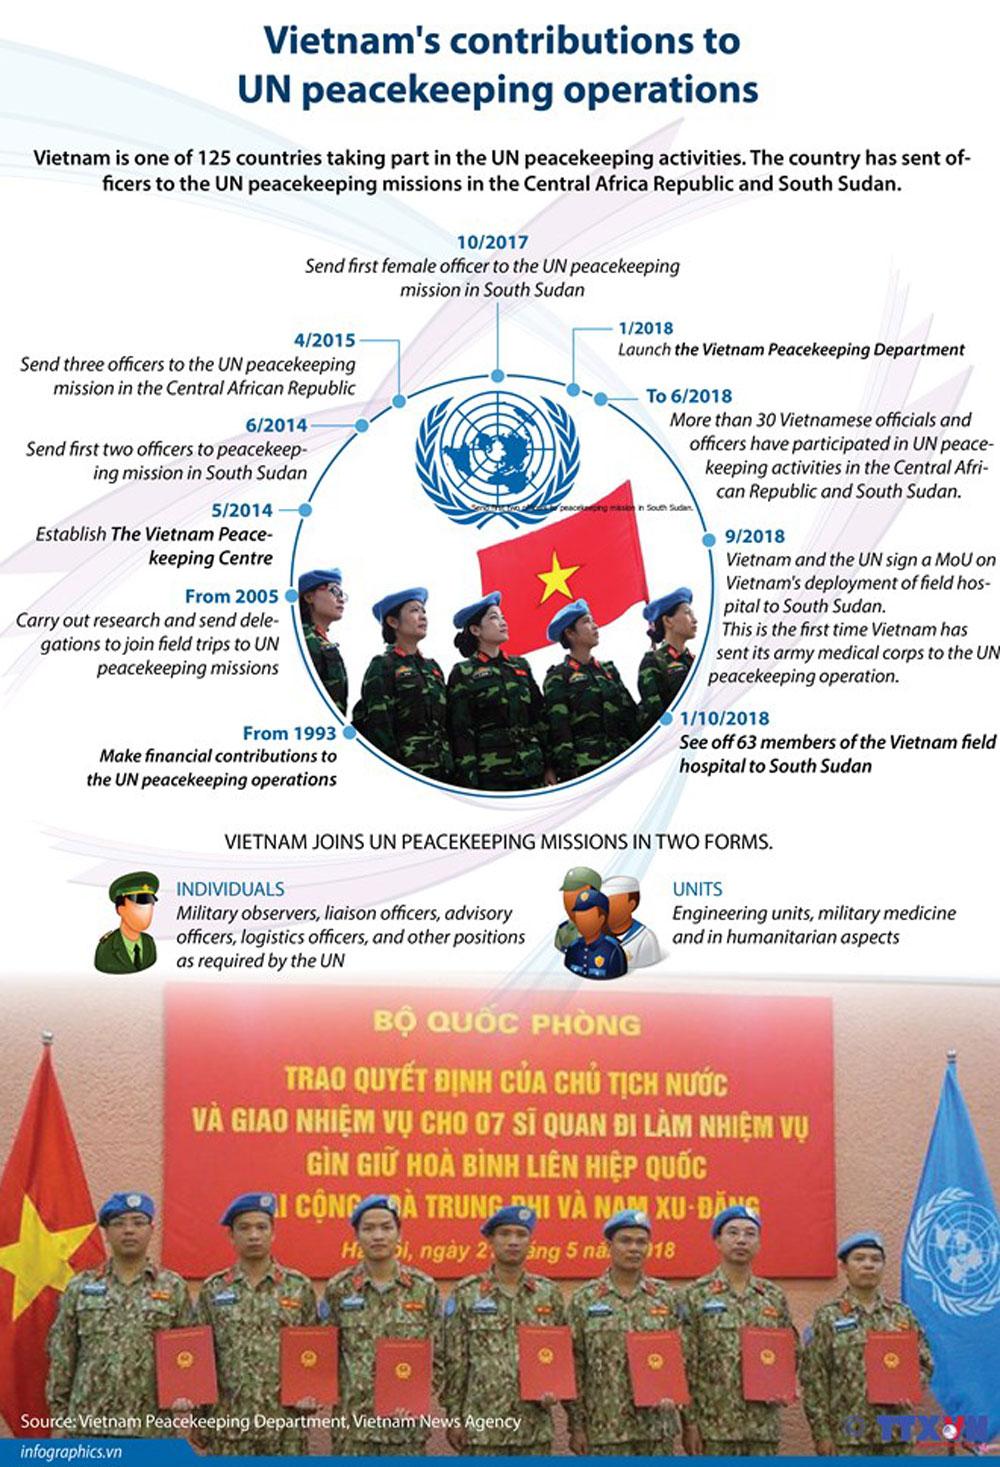 Vietnam's contributions, UN peacekeeping operations, peacekeeping mission, field trip, military medicine, humanitarian aspect